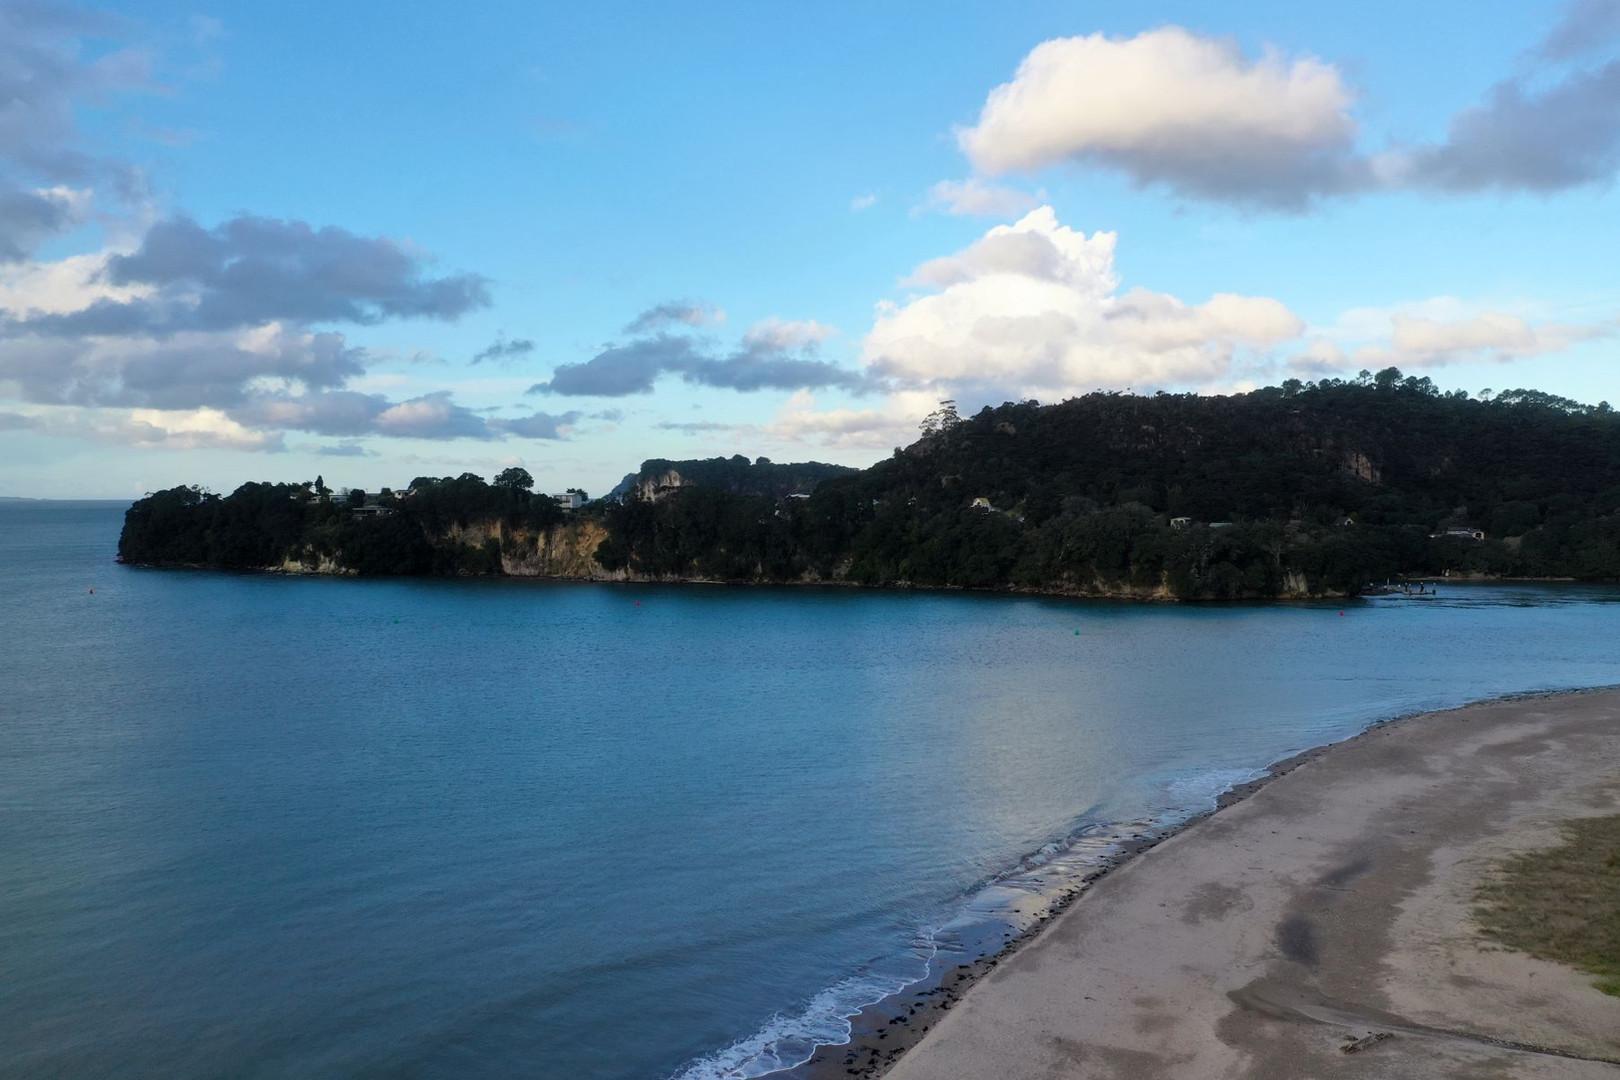 Sky View Mercury Bay